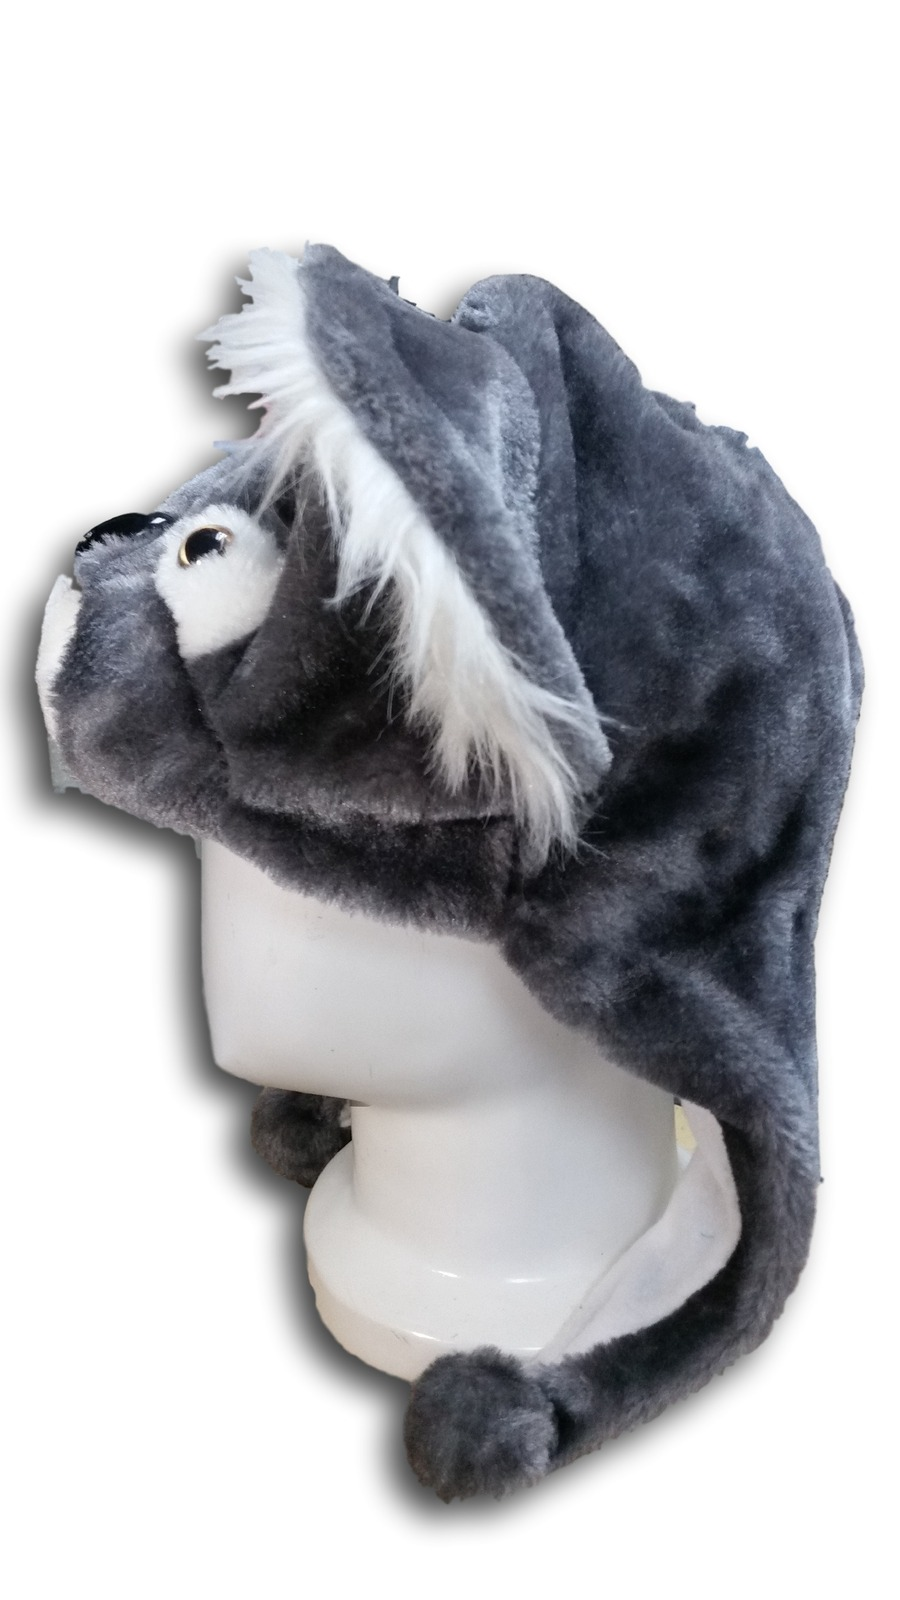 Cute Kawaii Anime Animal Hat Rave Beanie Cap Furry Plush Cosplay Silver Koala